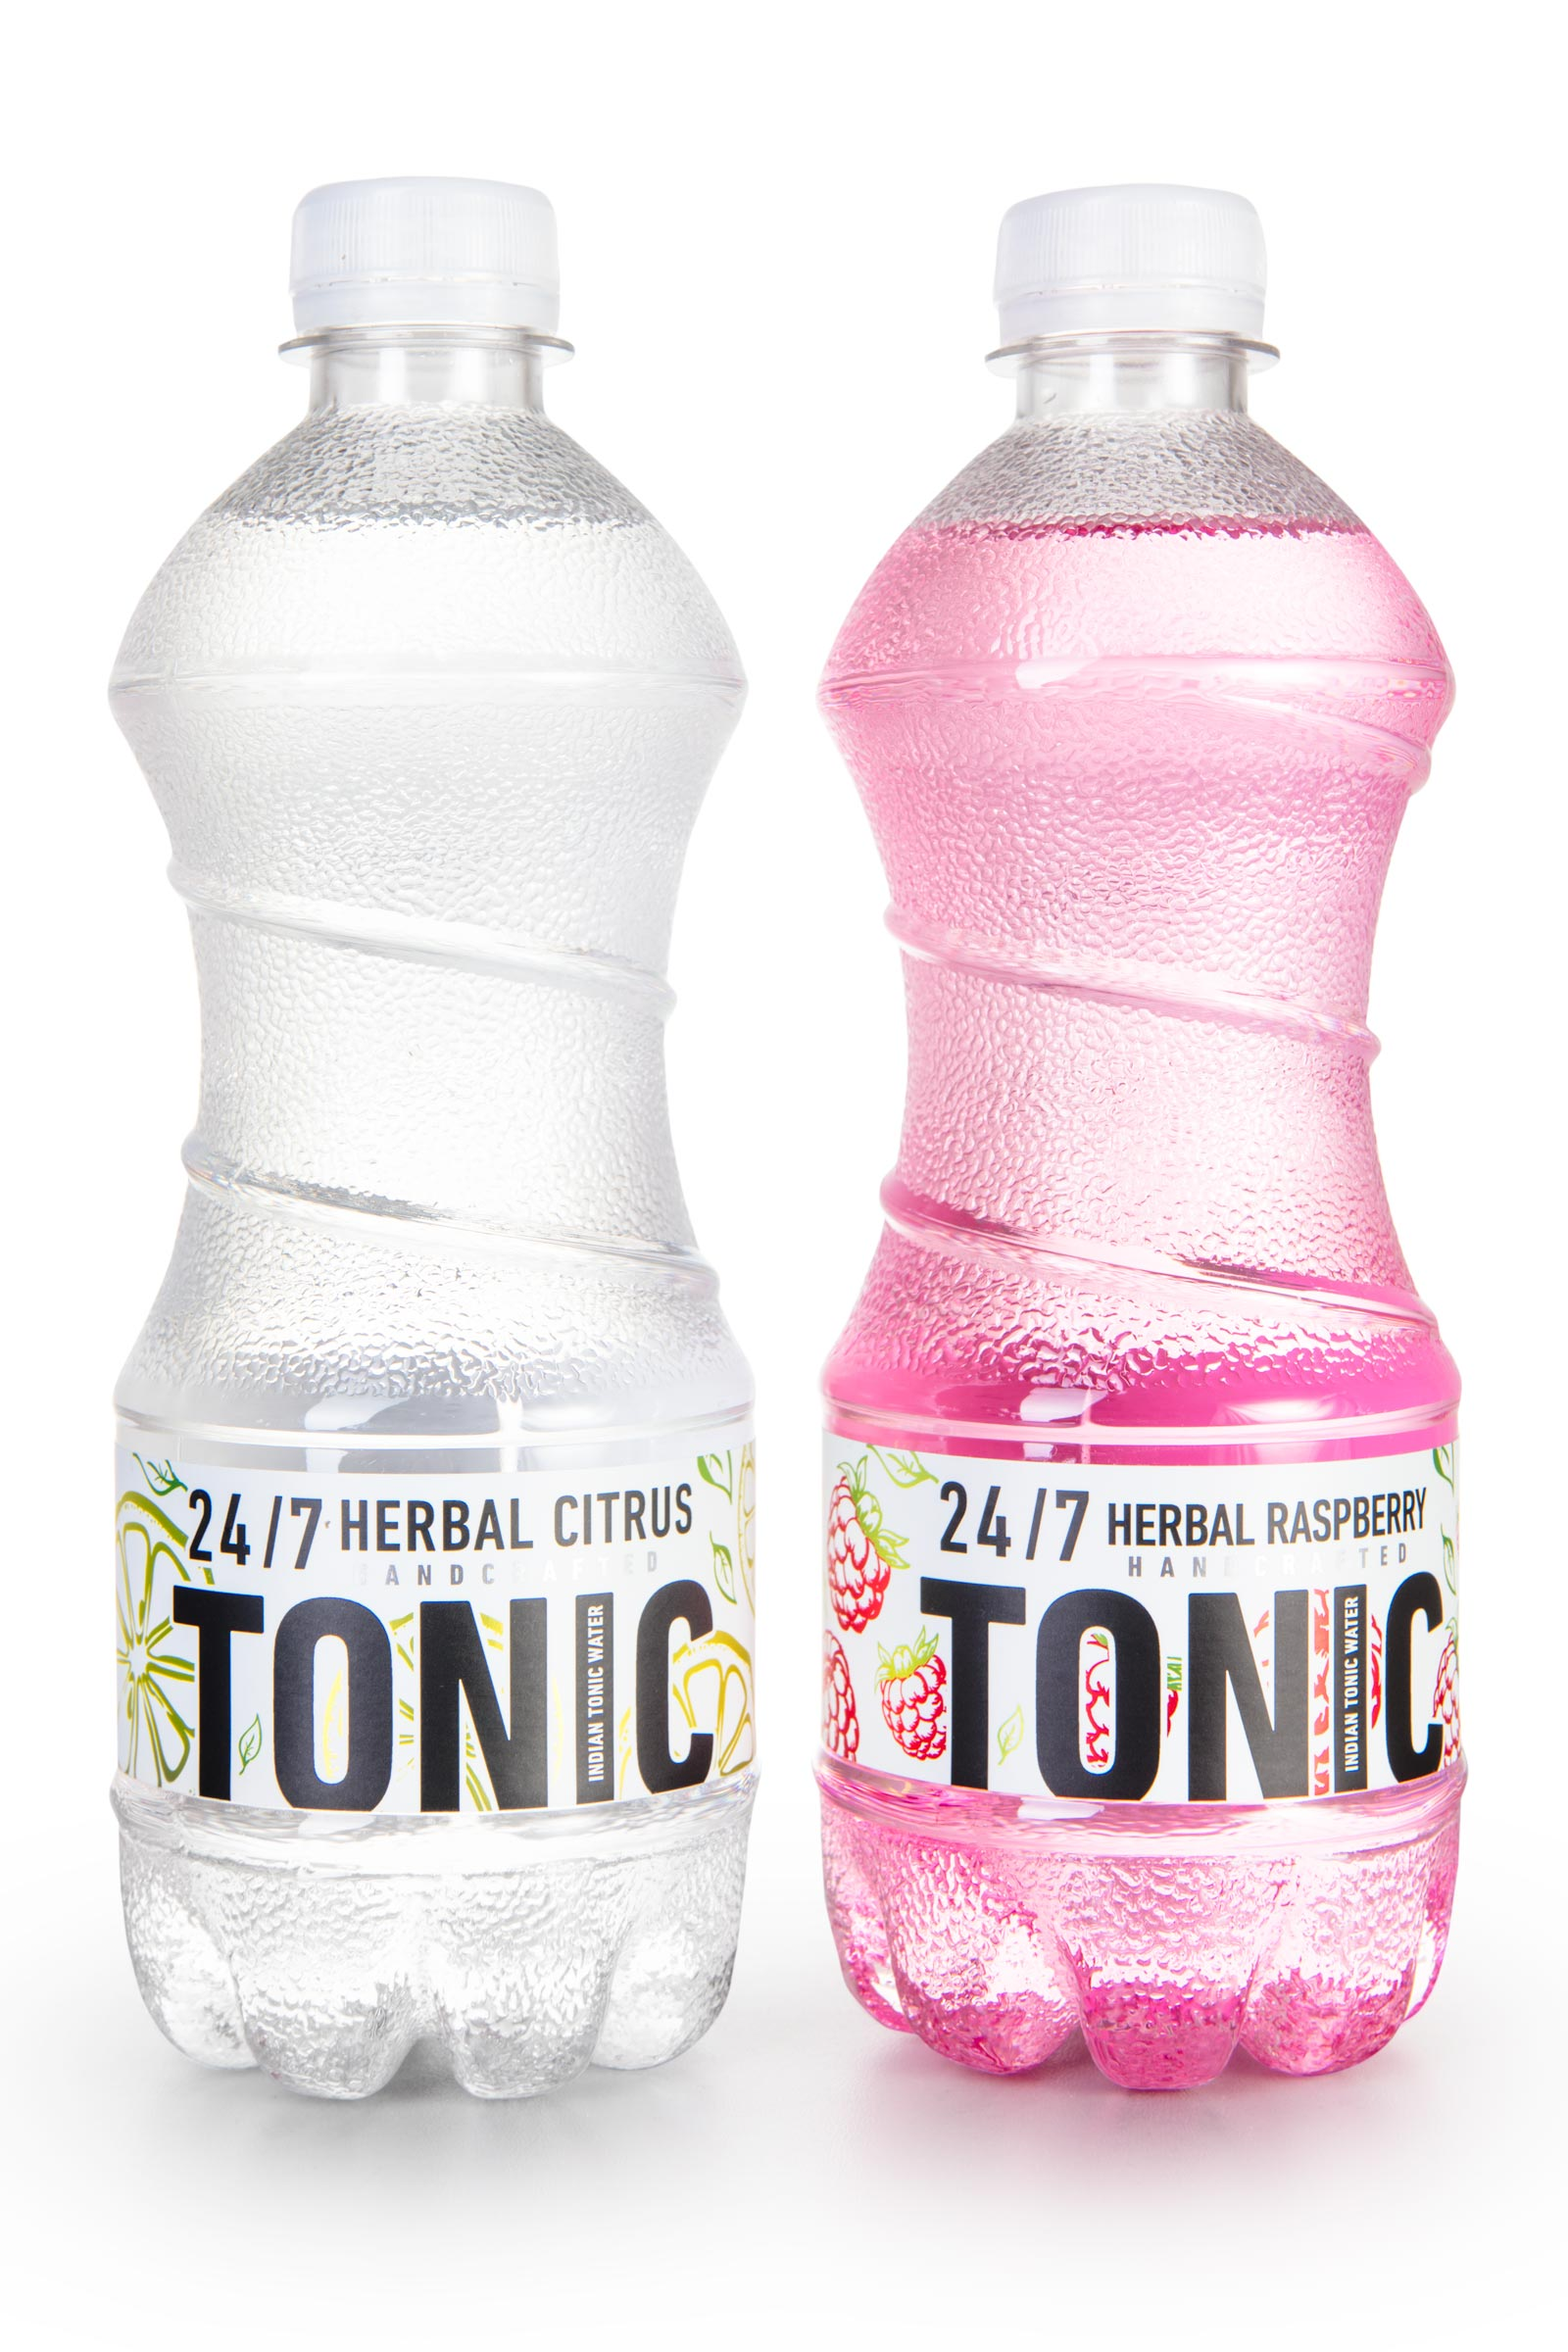 24/7 Herbal Tonic